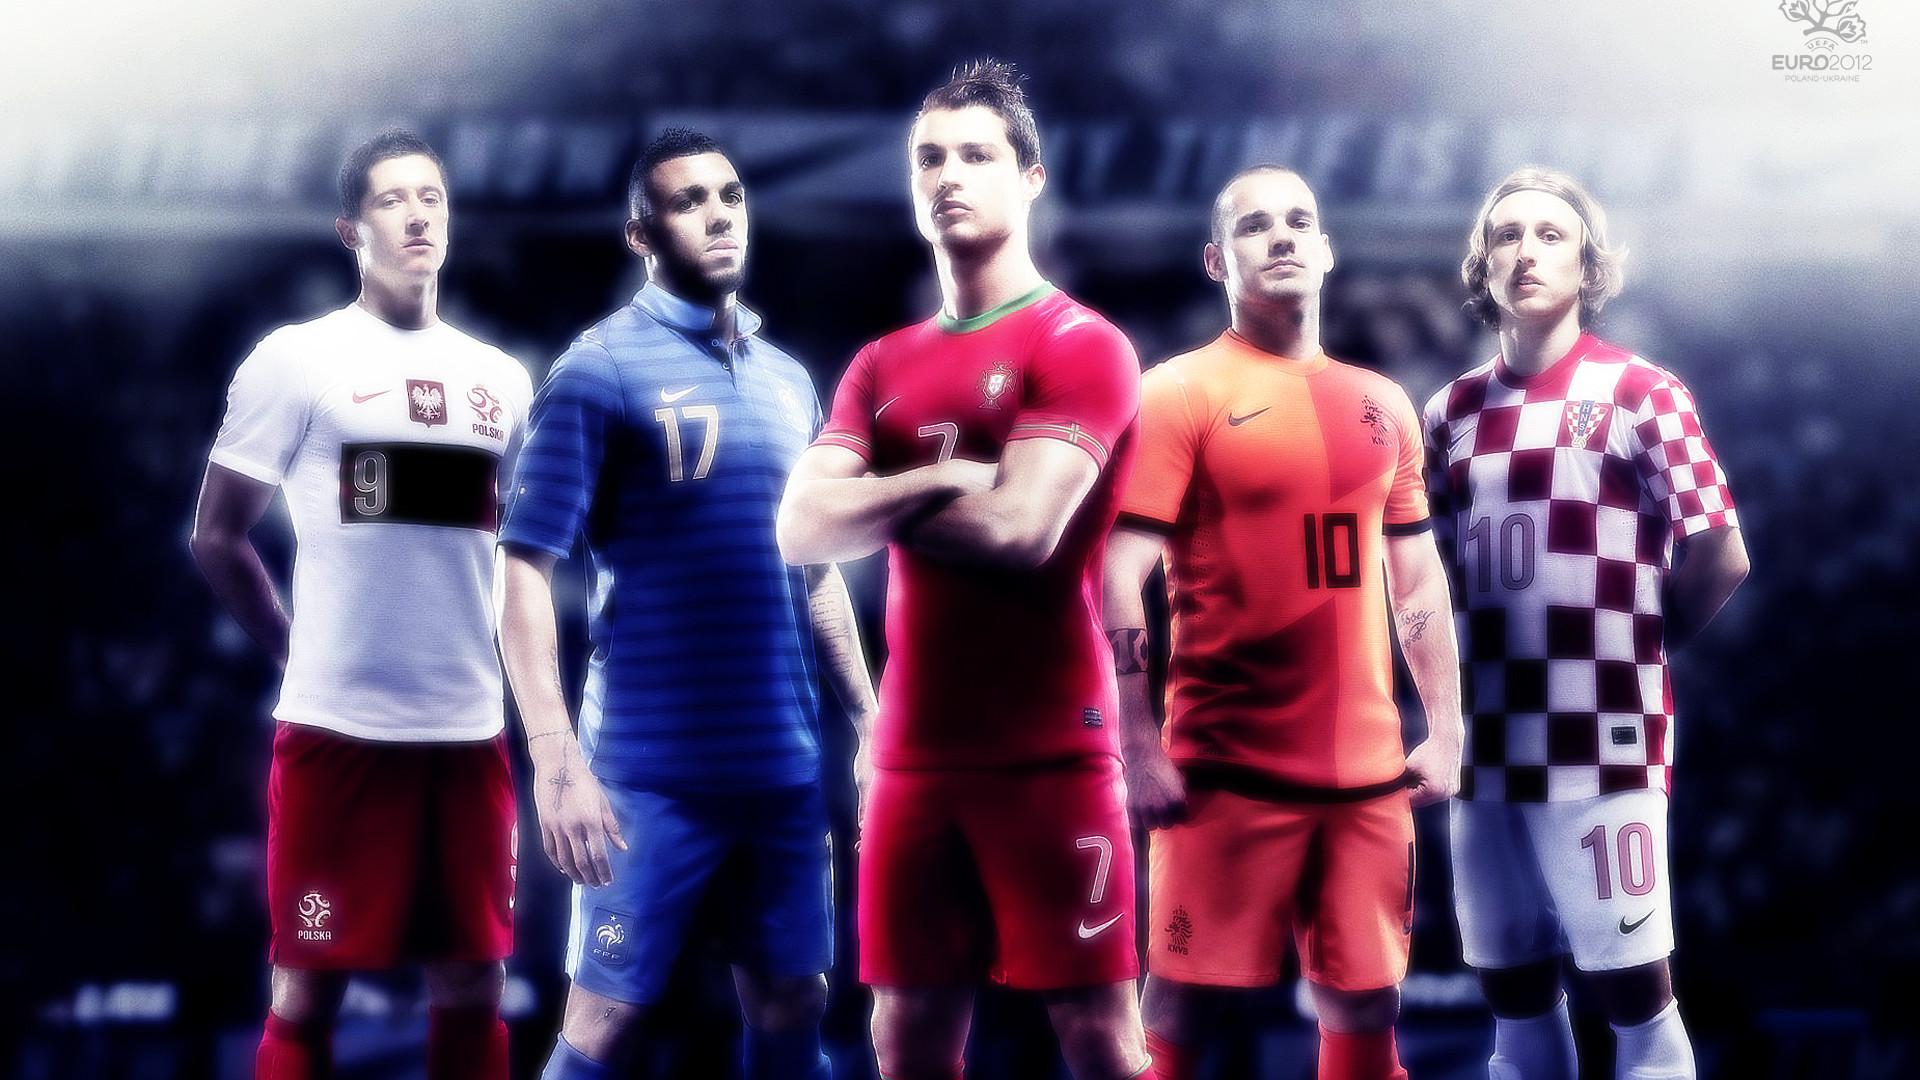 Res: 1920x1080, euro 2012 football soccer players teams portugal poland france nederlands  croatia